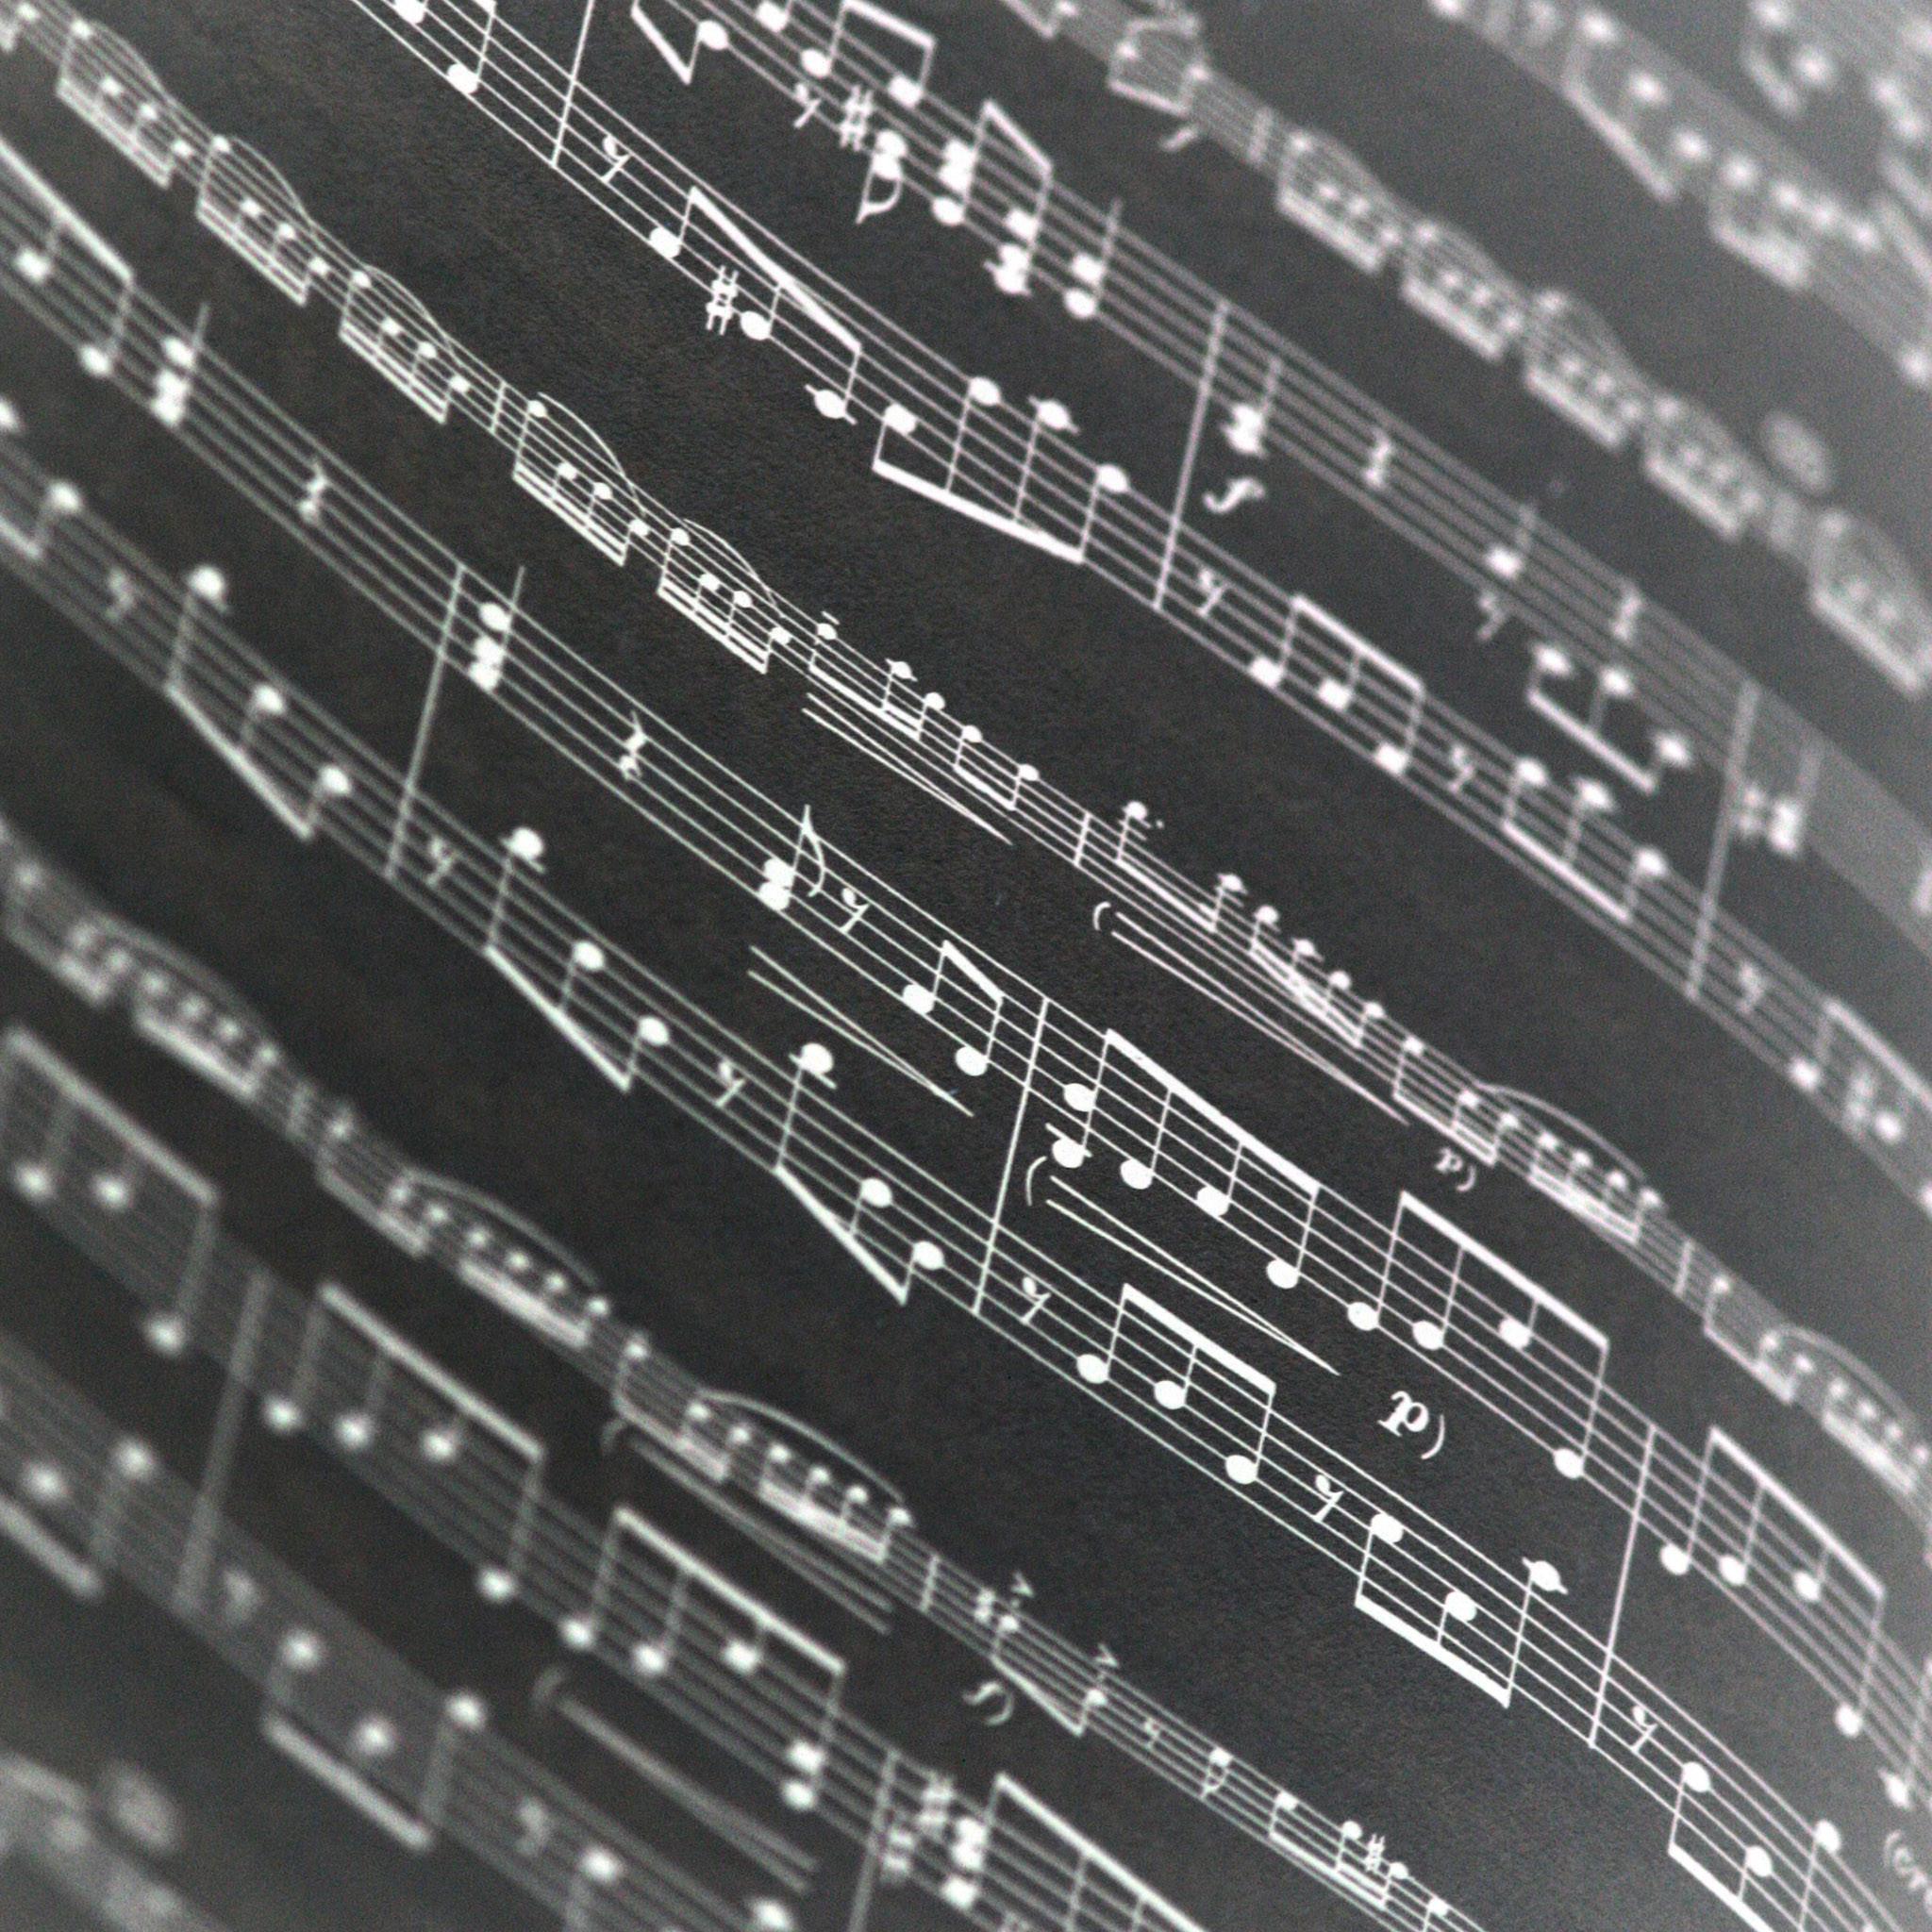 Music Sheet Wallpaper (63+ Images